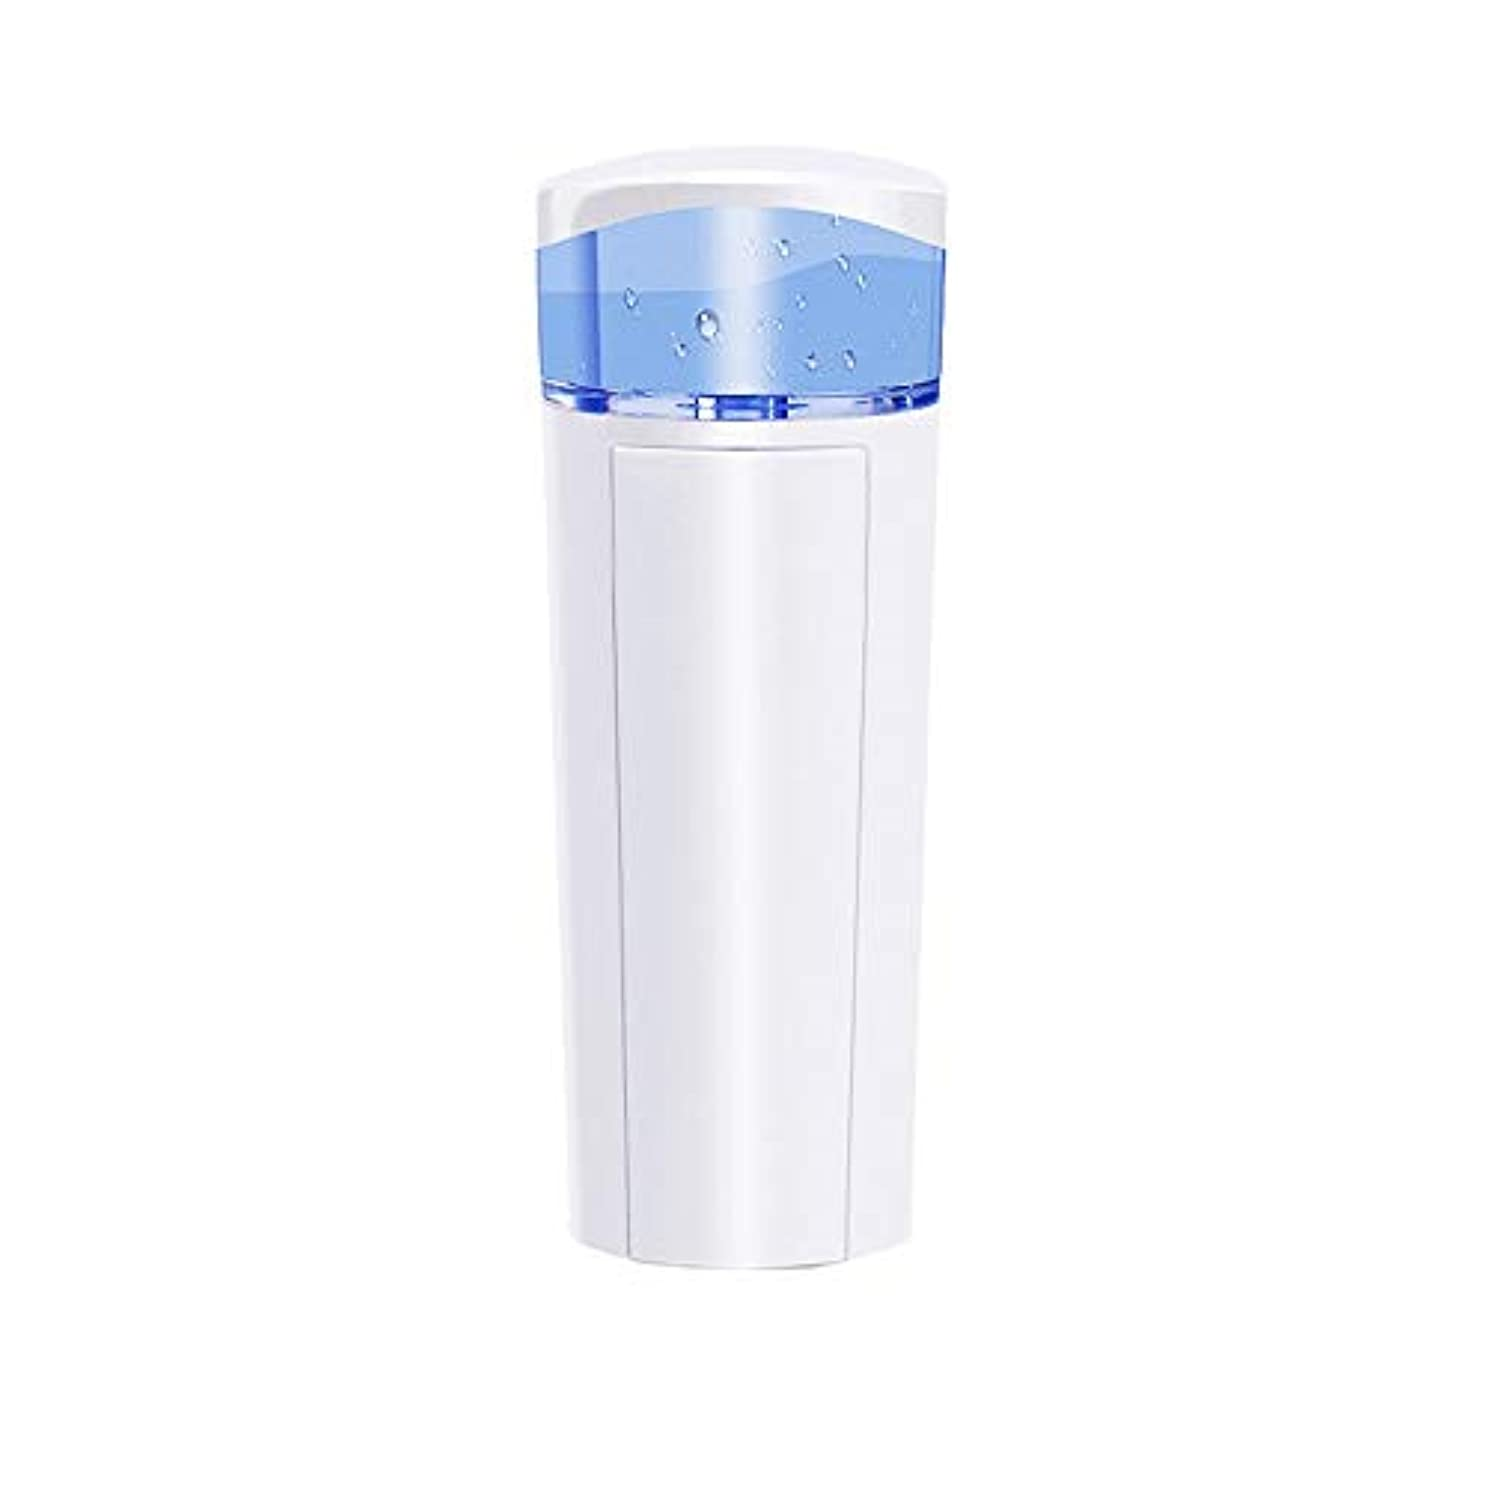 ZXF 充電宝物機能付き新しいナノ水道メータースプレー美容機器ABS素材ホワイト 滑らかである